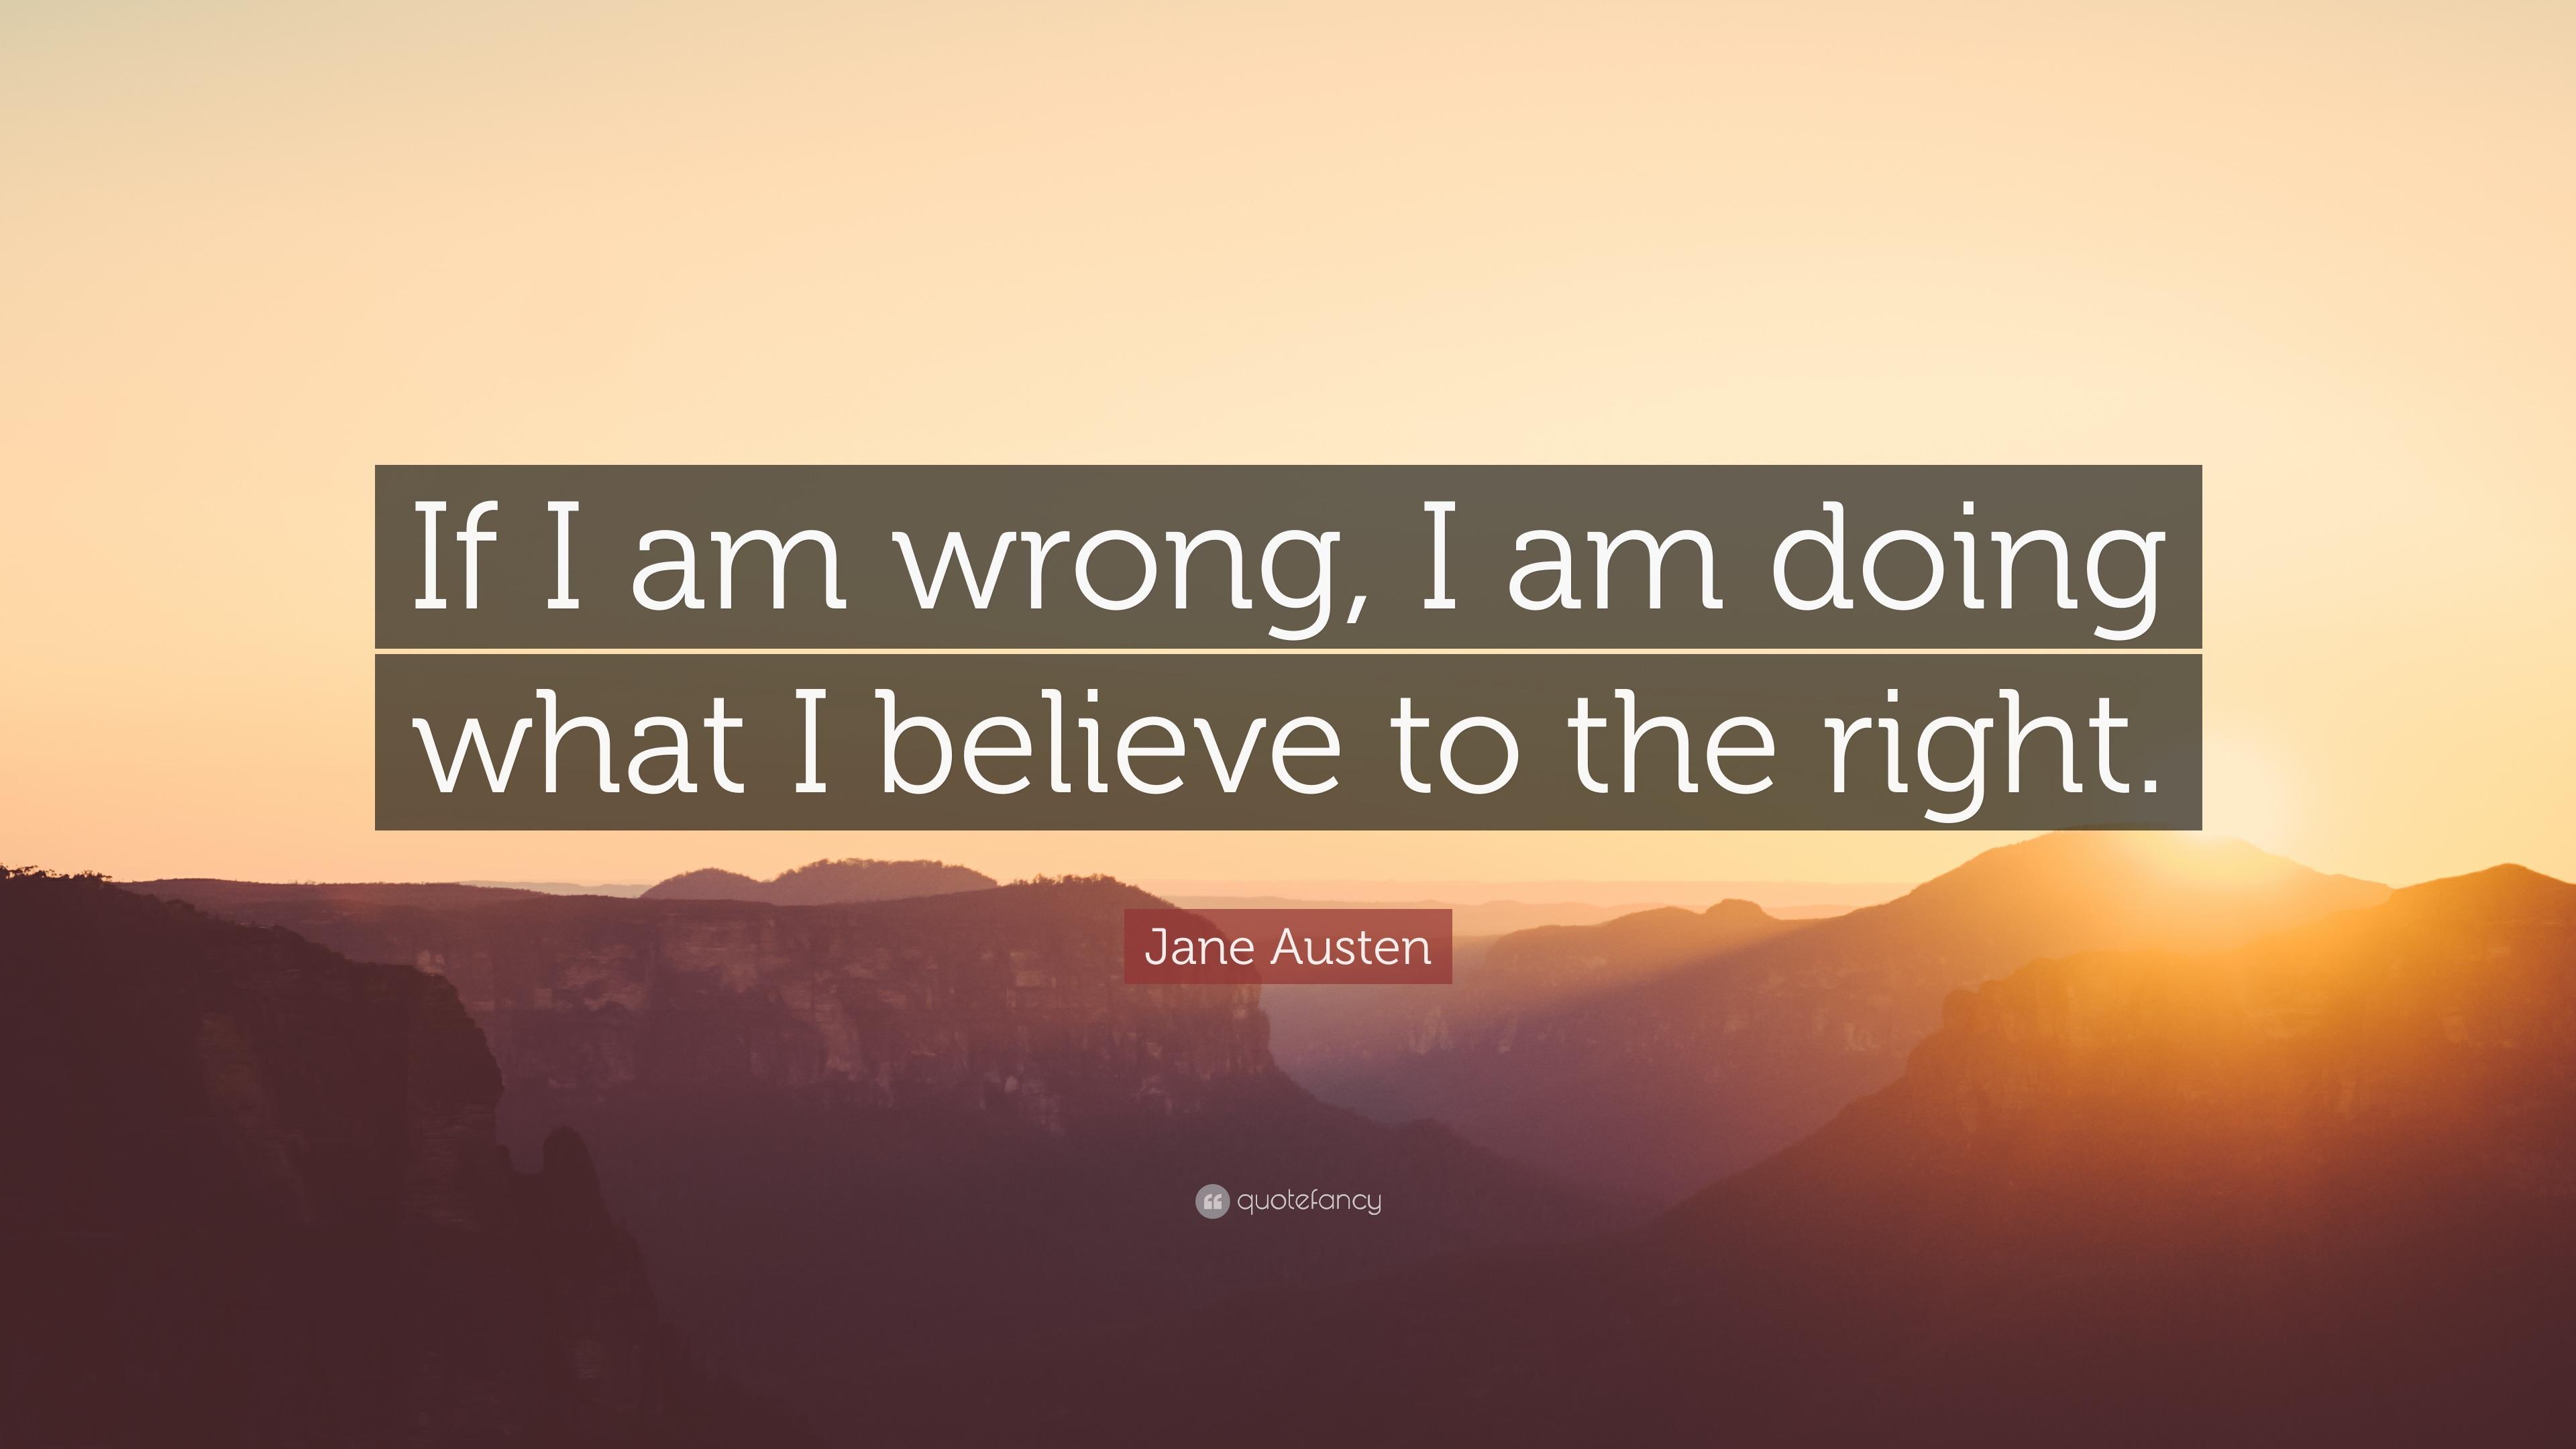 Dalai Lama Quotes Wallpaper Jane Austen Quotes 100 Wallpapers Quotefancy